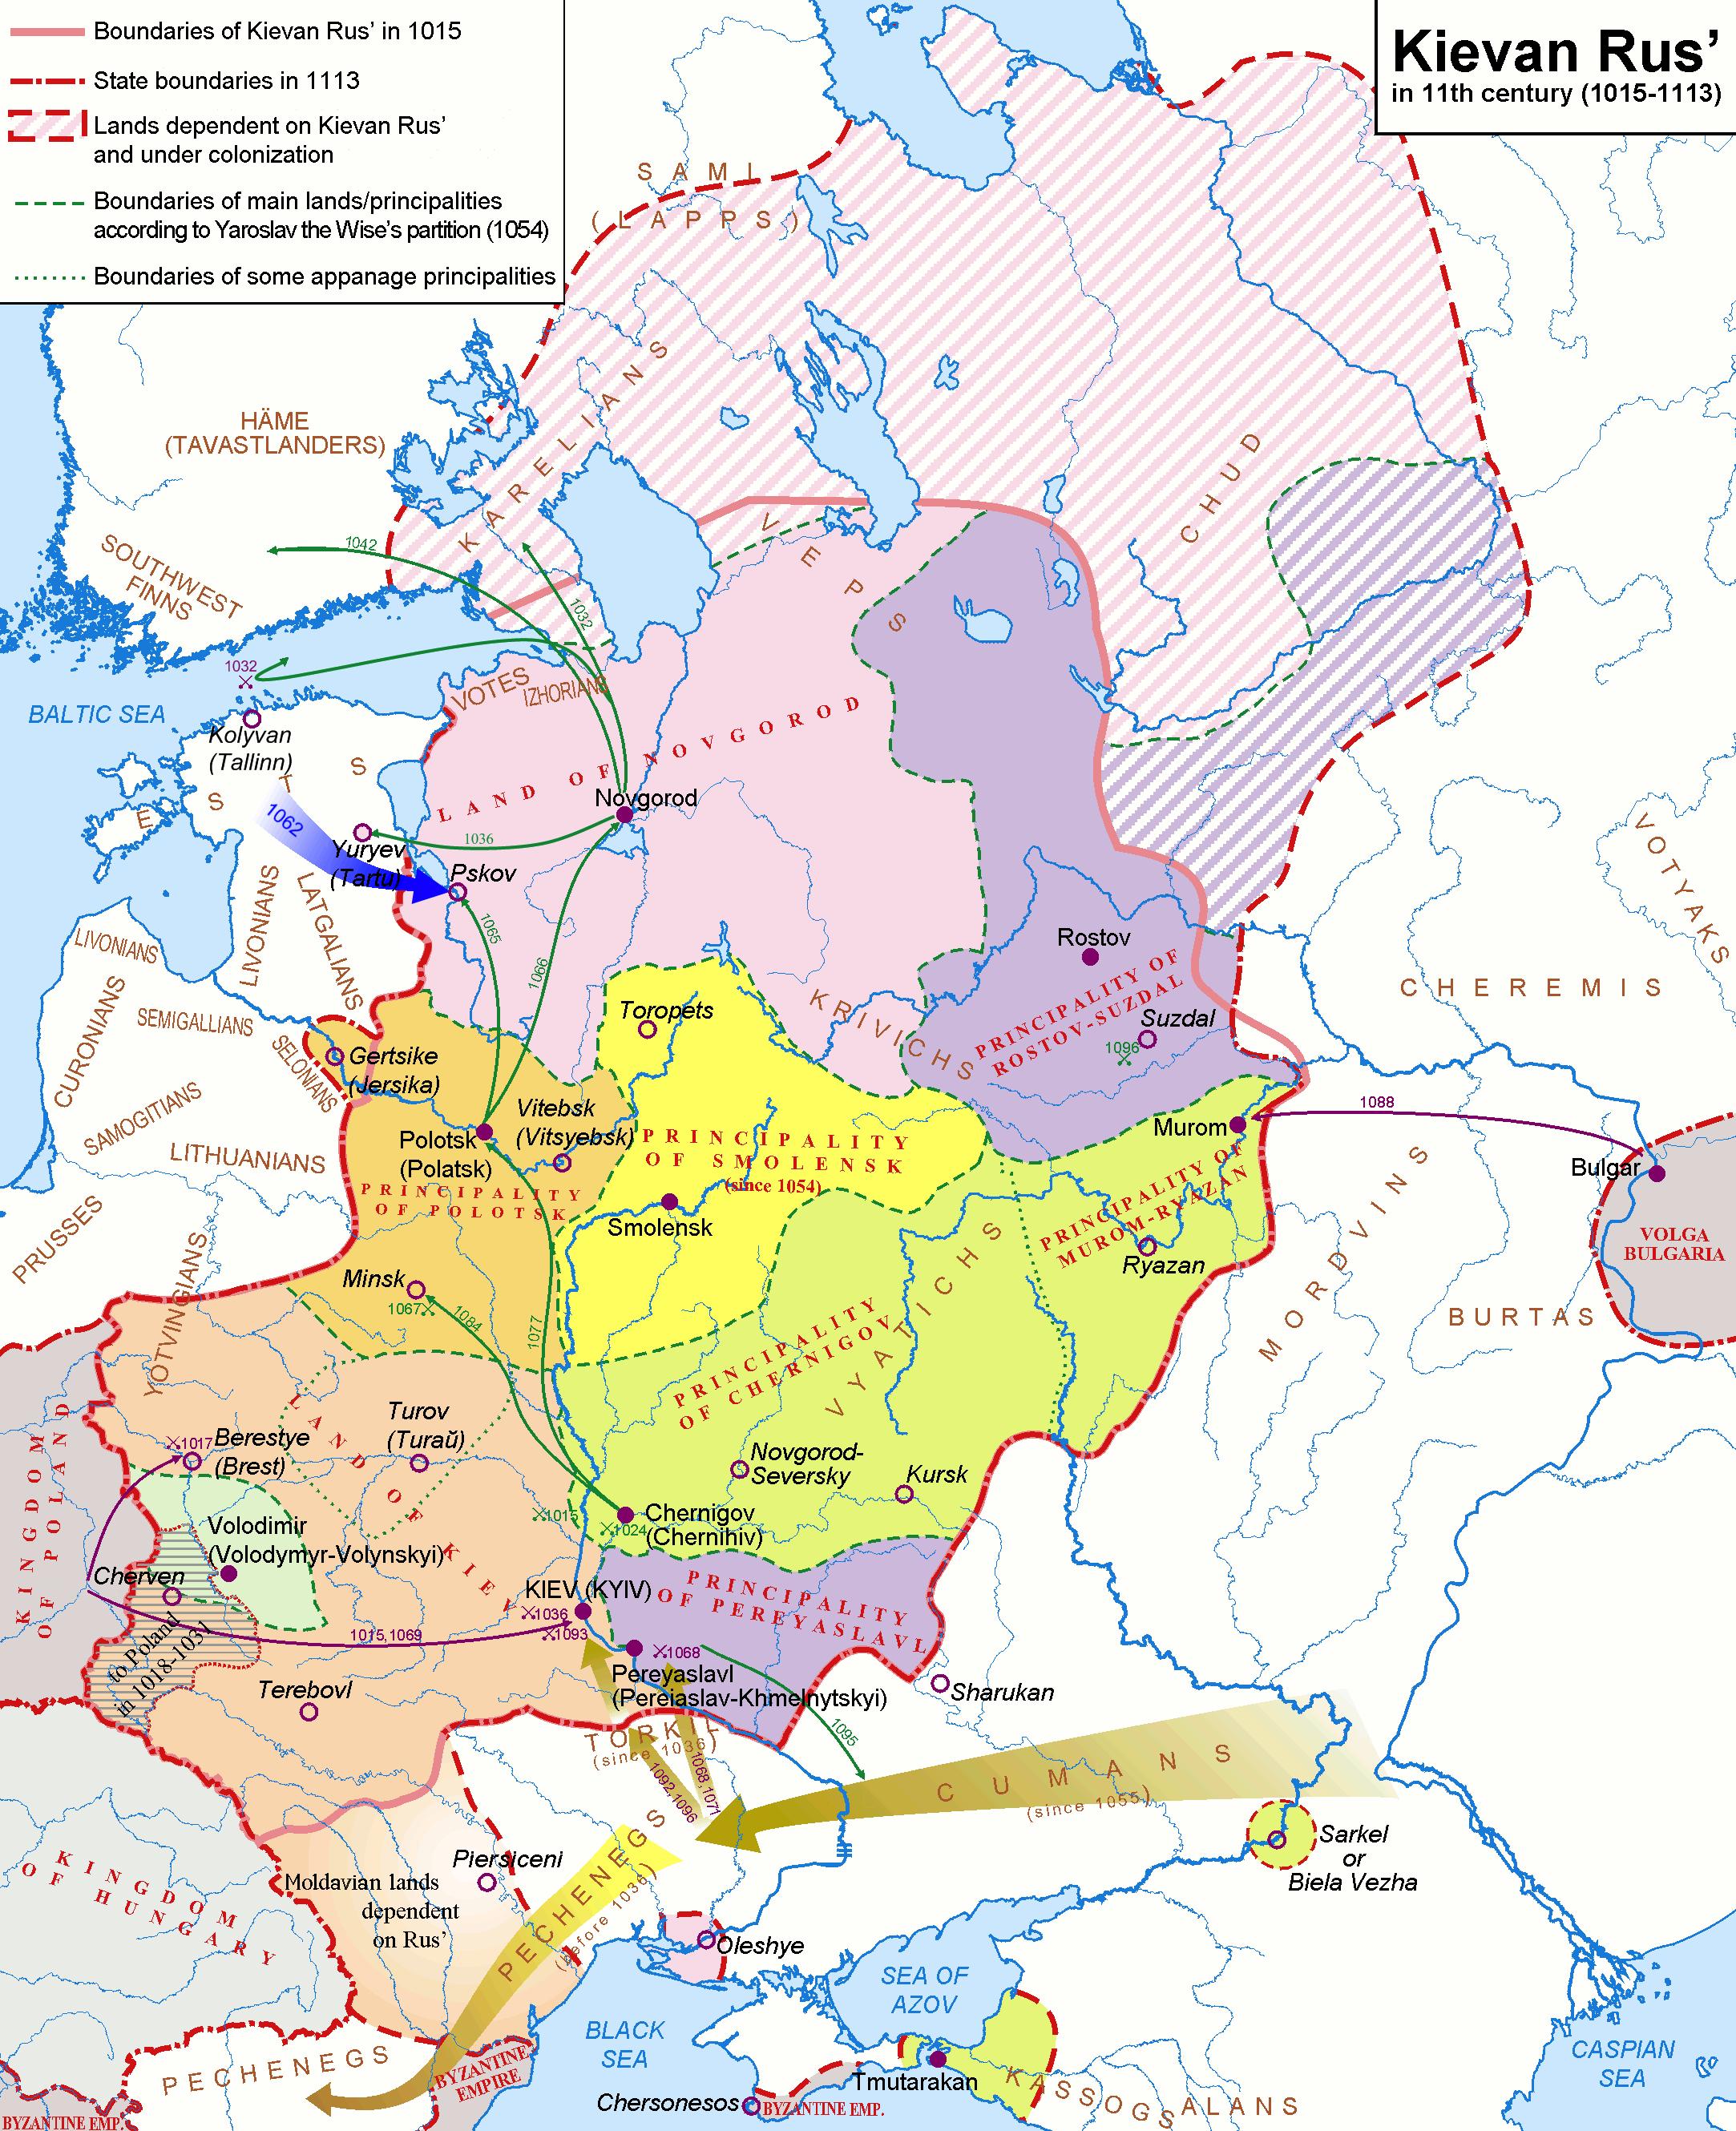 http://upload.wikimedia.org/wikipedia/commons/4/4e/Kievan-rus-1015-1113-%28en%29.png